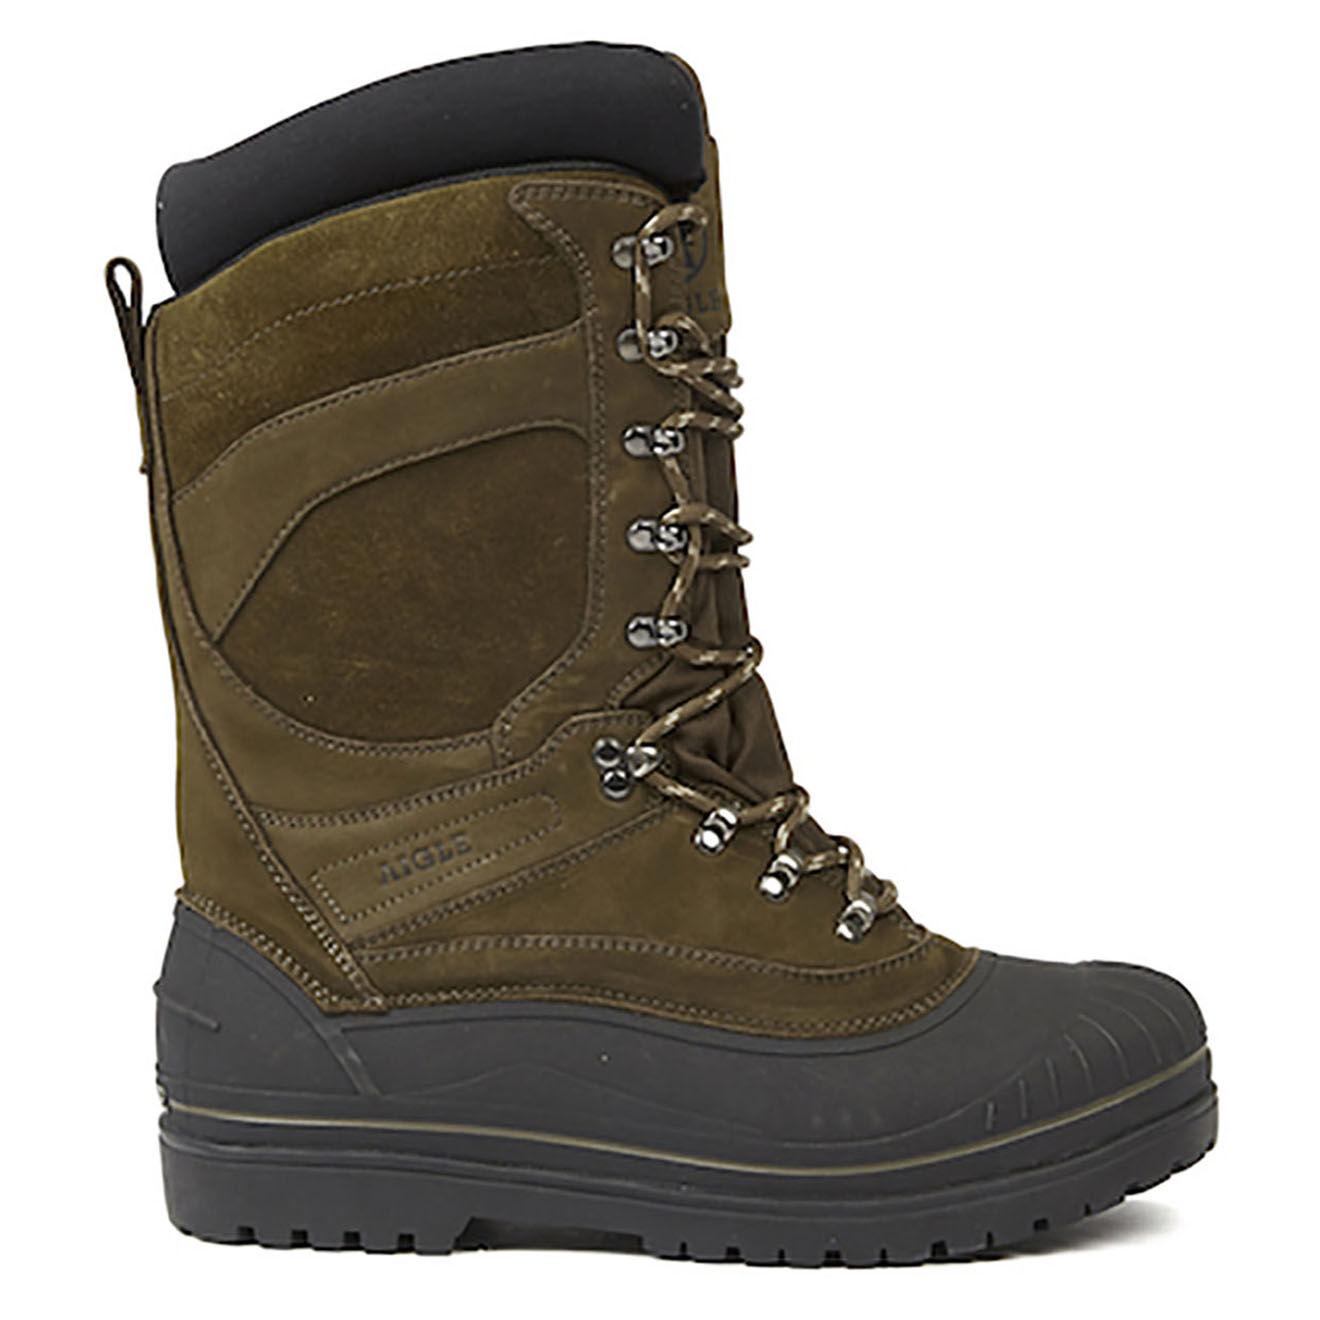 Chaussures hautes en Cuir Belfy sepia - Aigle - Modalova